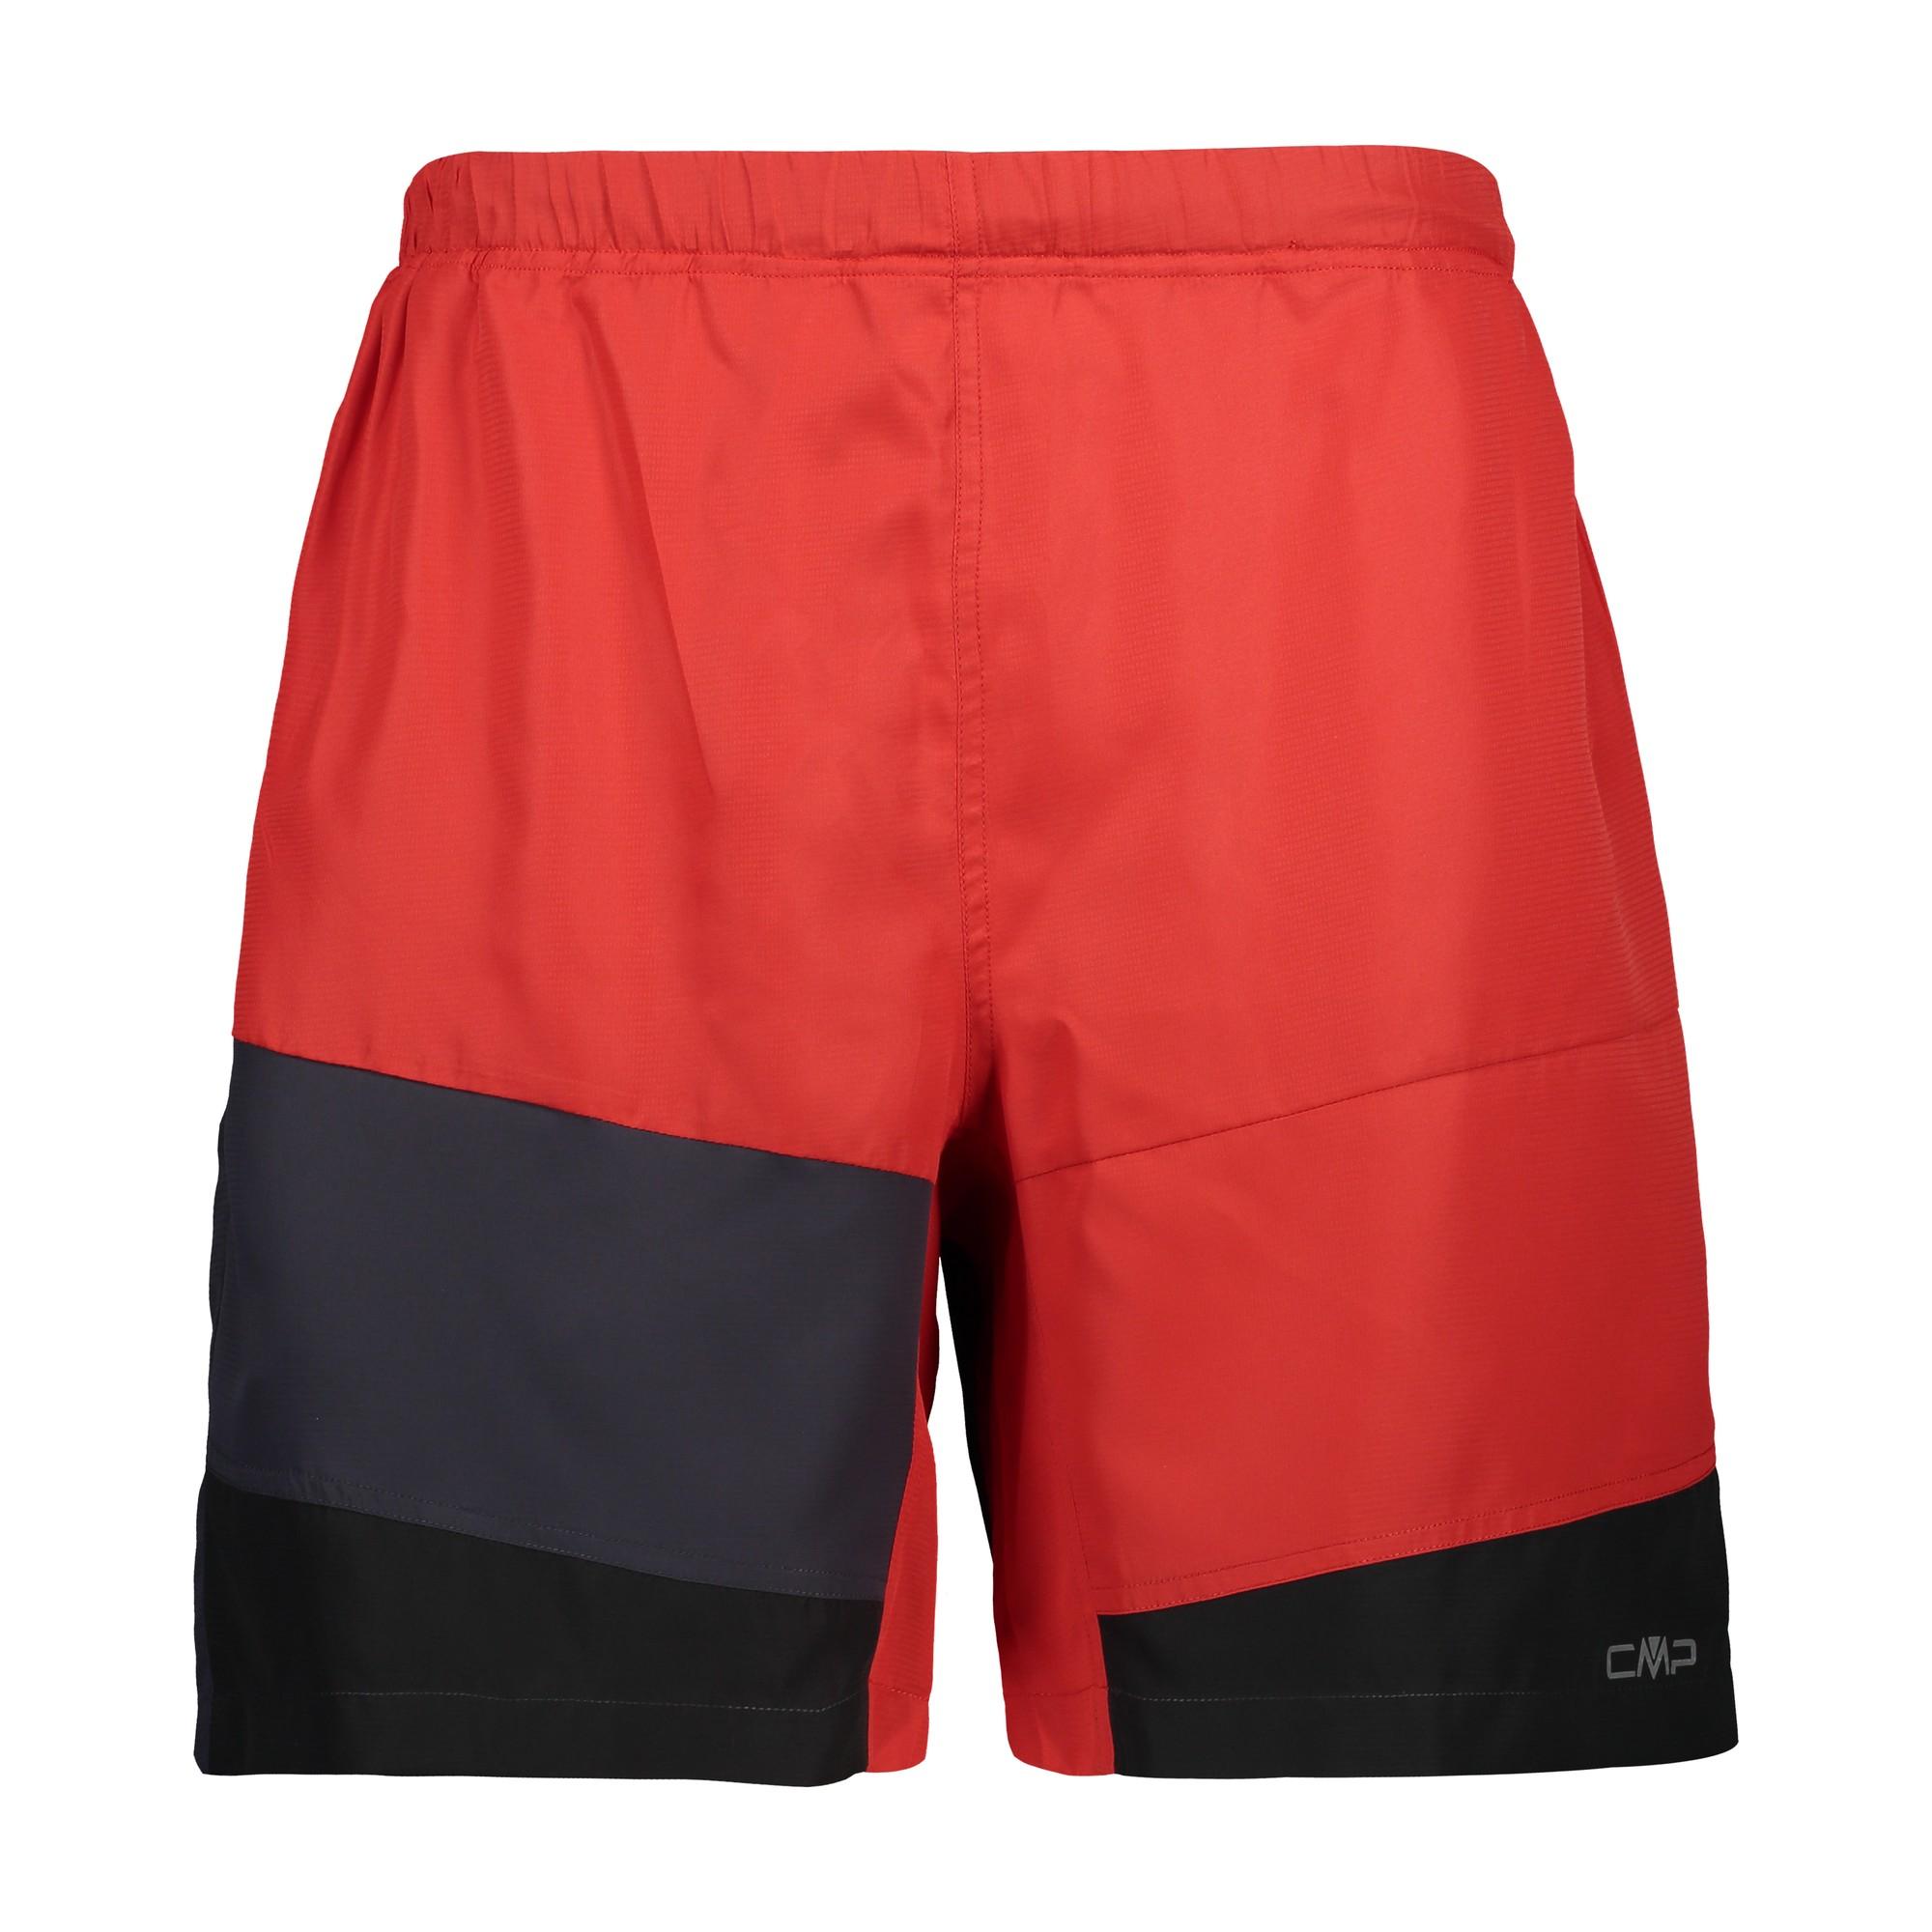 CMP Damen Shorts Laufhose